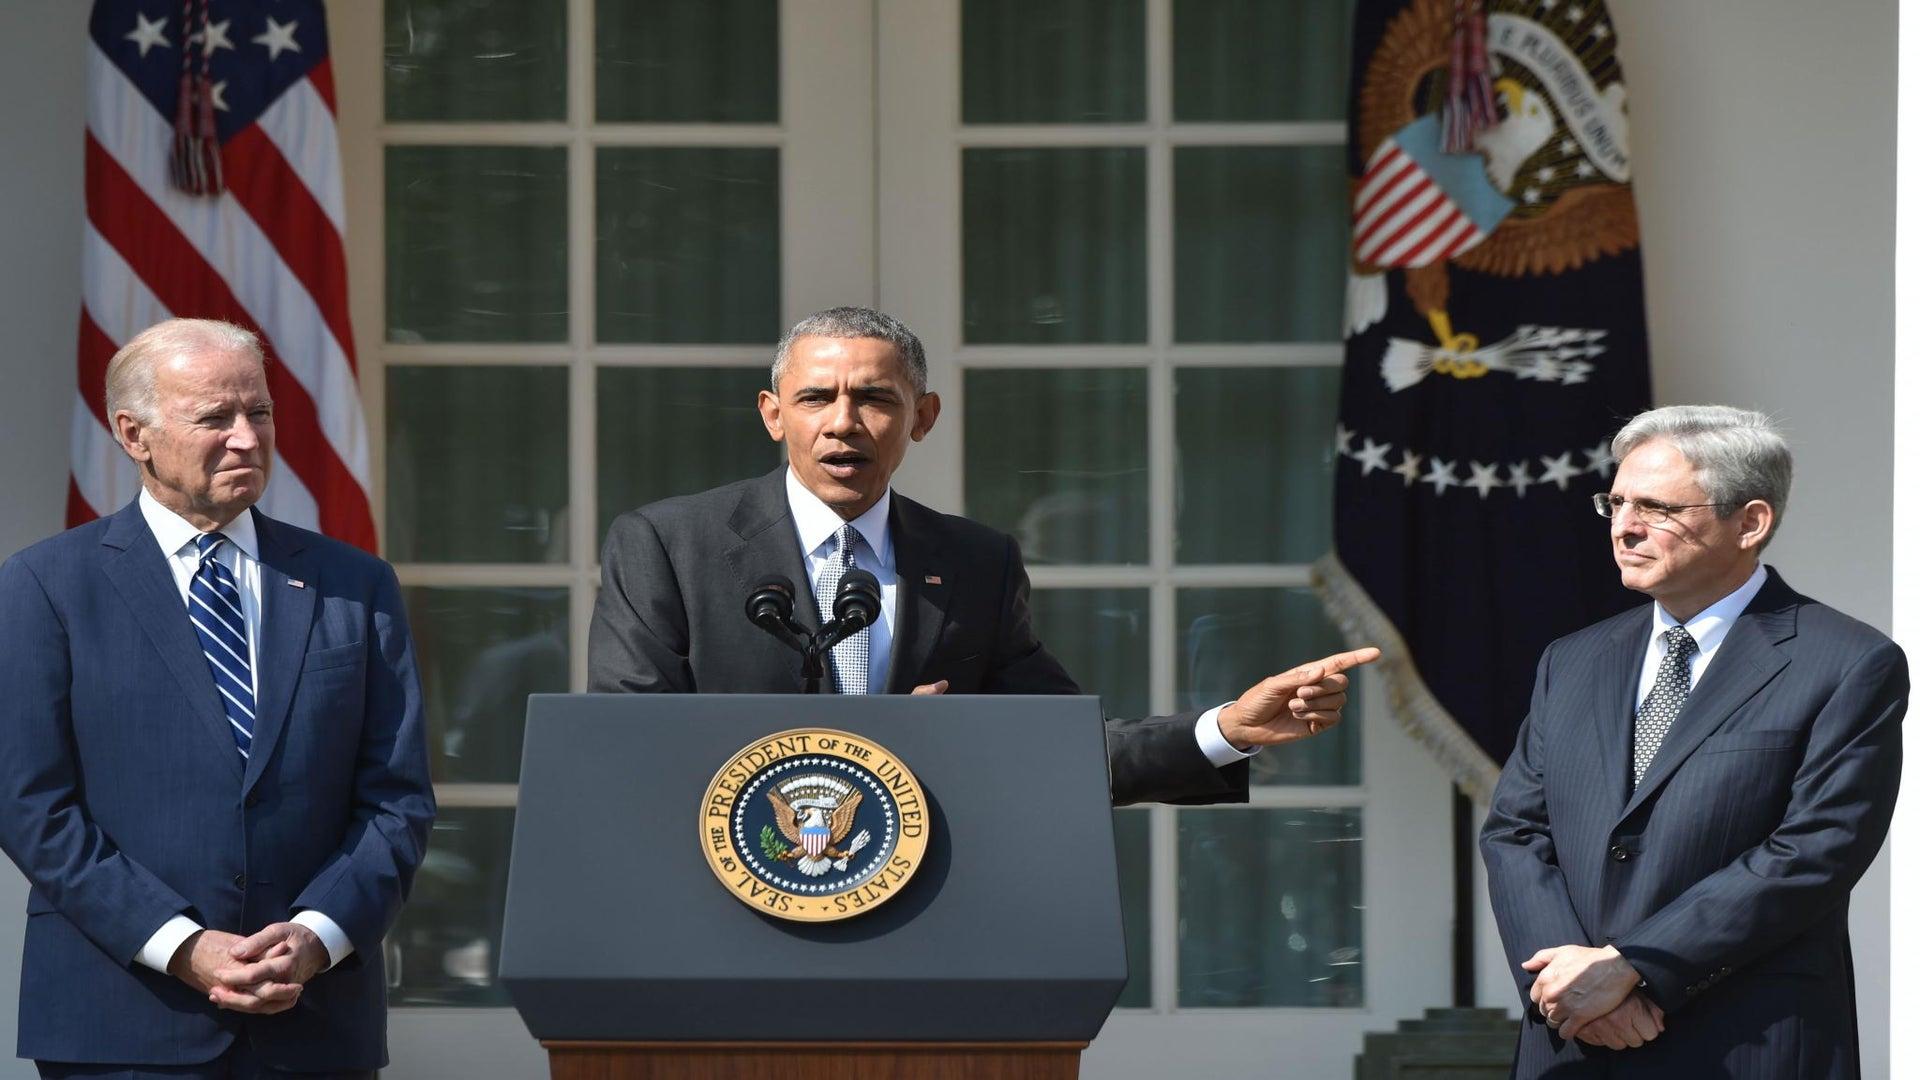 President Obama Names Merrick Garland as SCOTUS Nominee